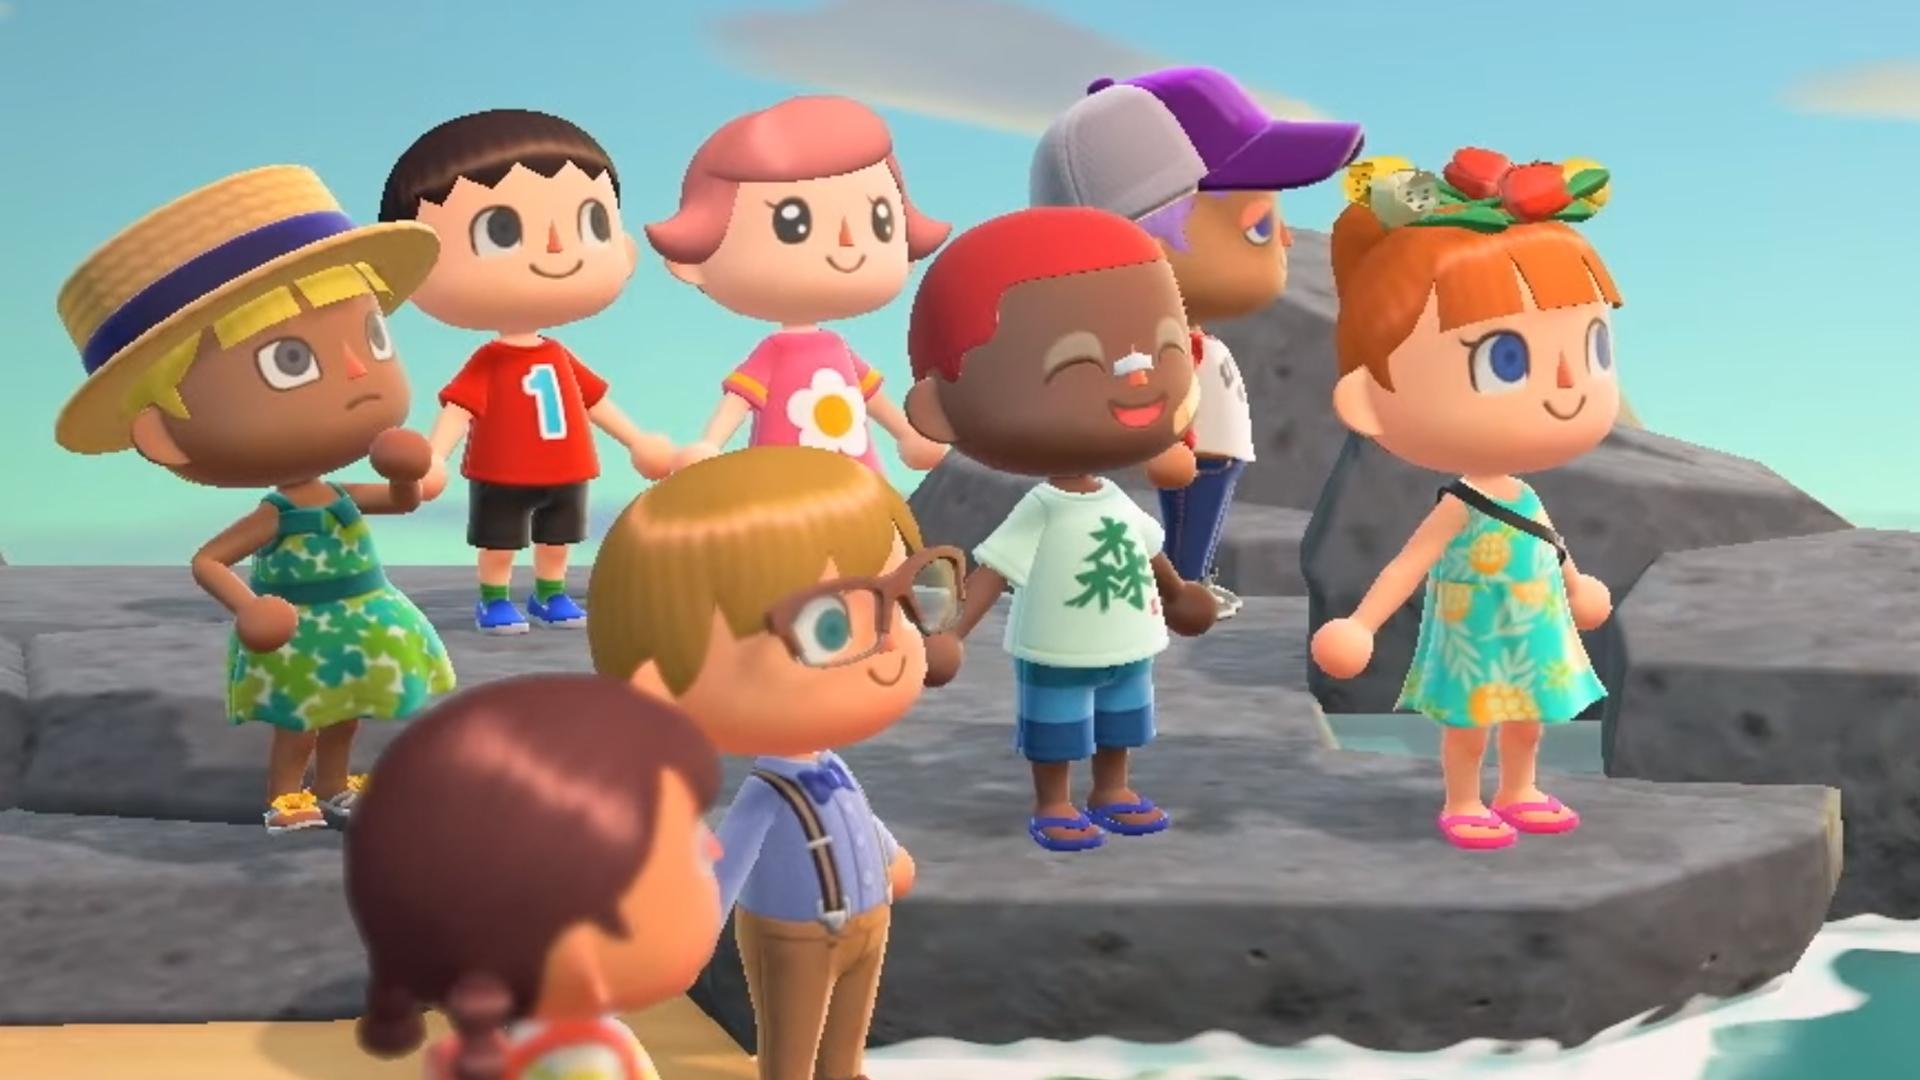 E3 2019: confira os destaques da conferência da Nintendo